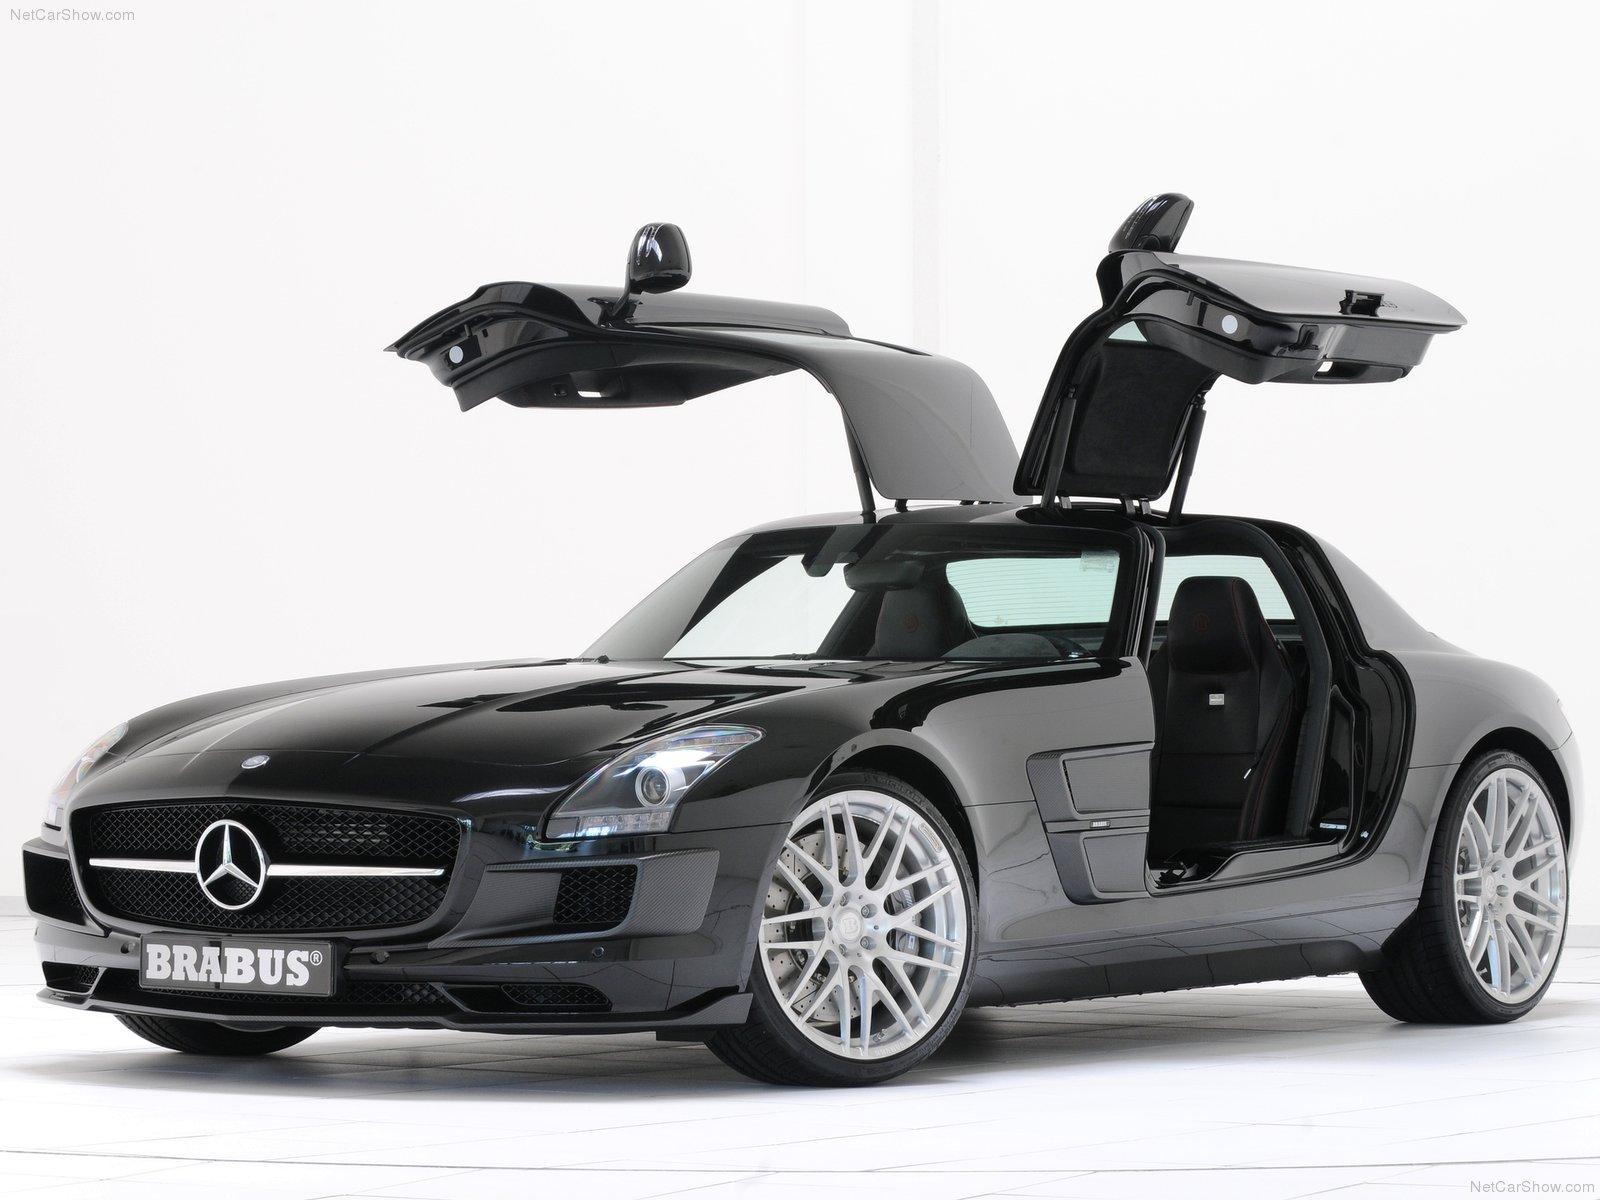 http://4.bp.blogspot.com/_D5hgPjGJZ54/THv-kQmlaTI/AAAAAAAAD5I/1BH5s3OGS_U/s1600/Brabus-Mercedes-Benz_SLS_AMG_2011_1600x1200_wallpaper_09.jpg